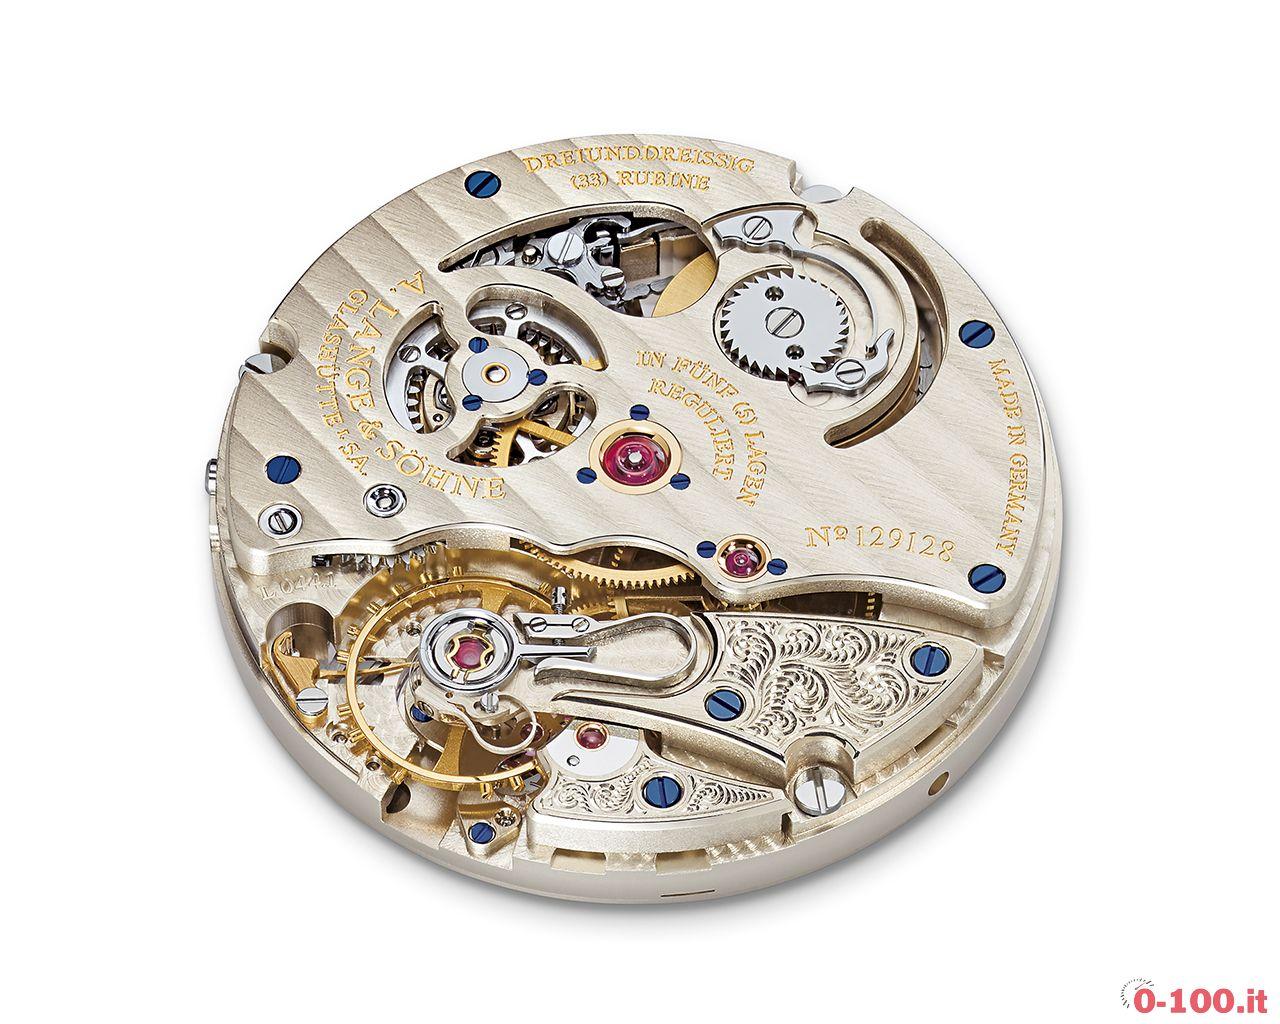 a-lange-sohne-richard-lange-pour-le-merite-limited-edition-ref-260-028-prezzo-price_0-1003